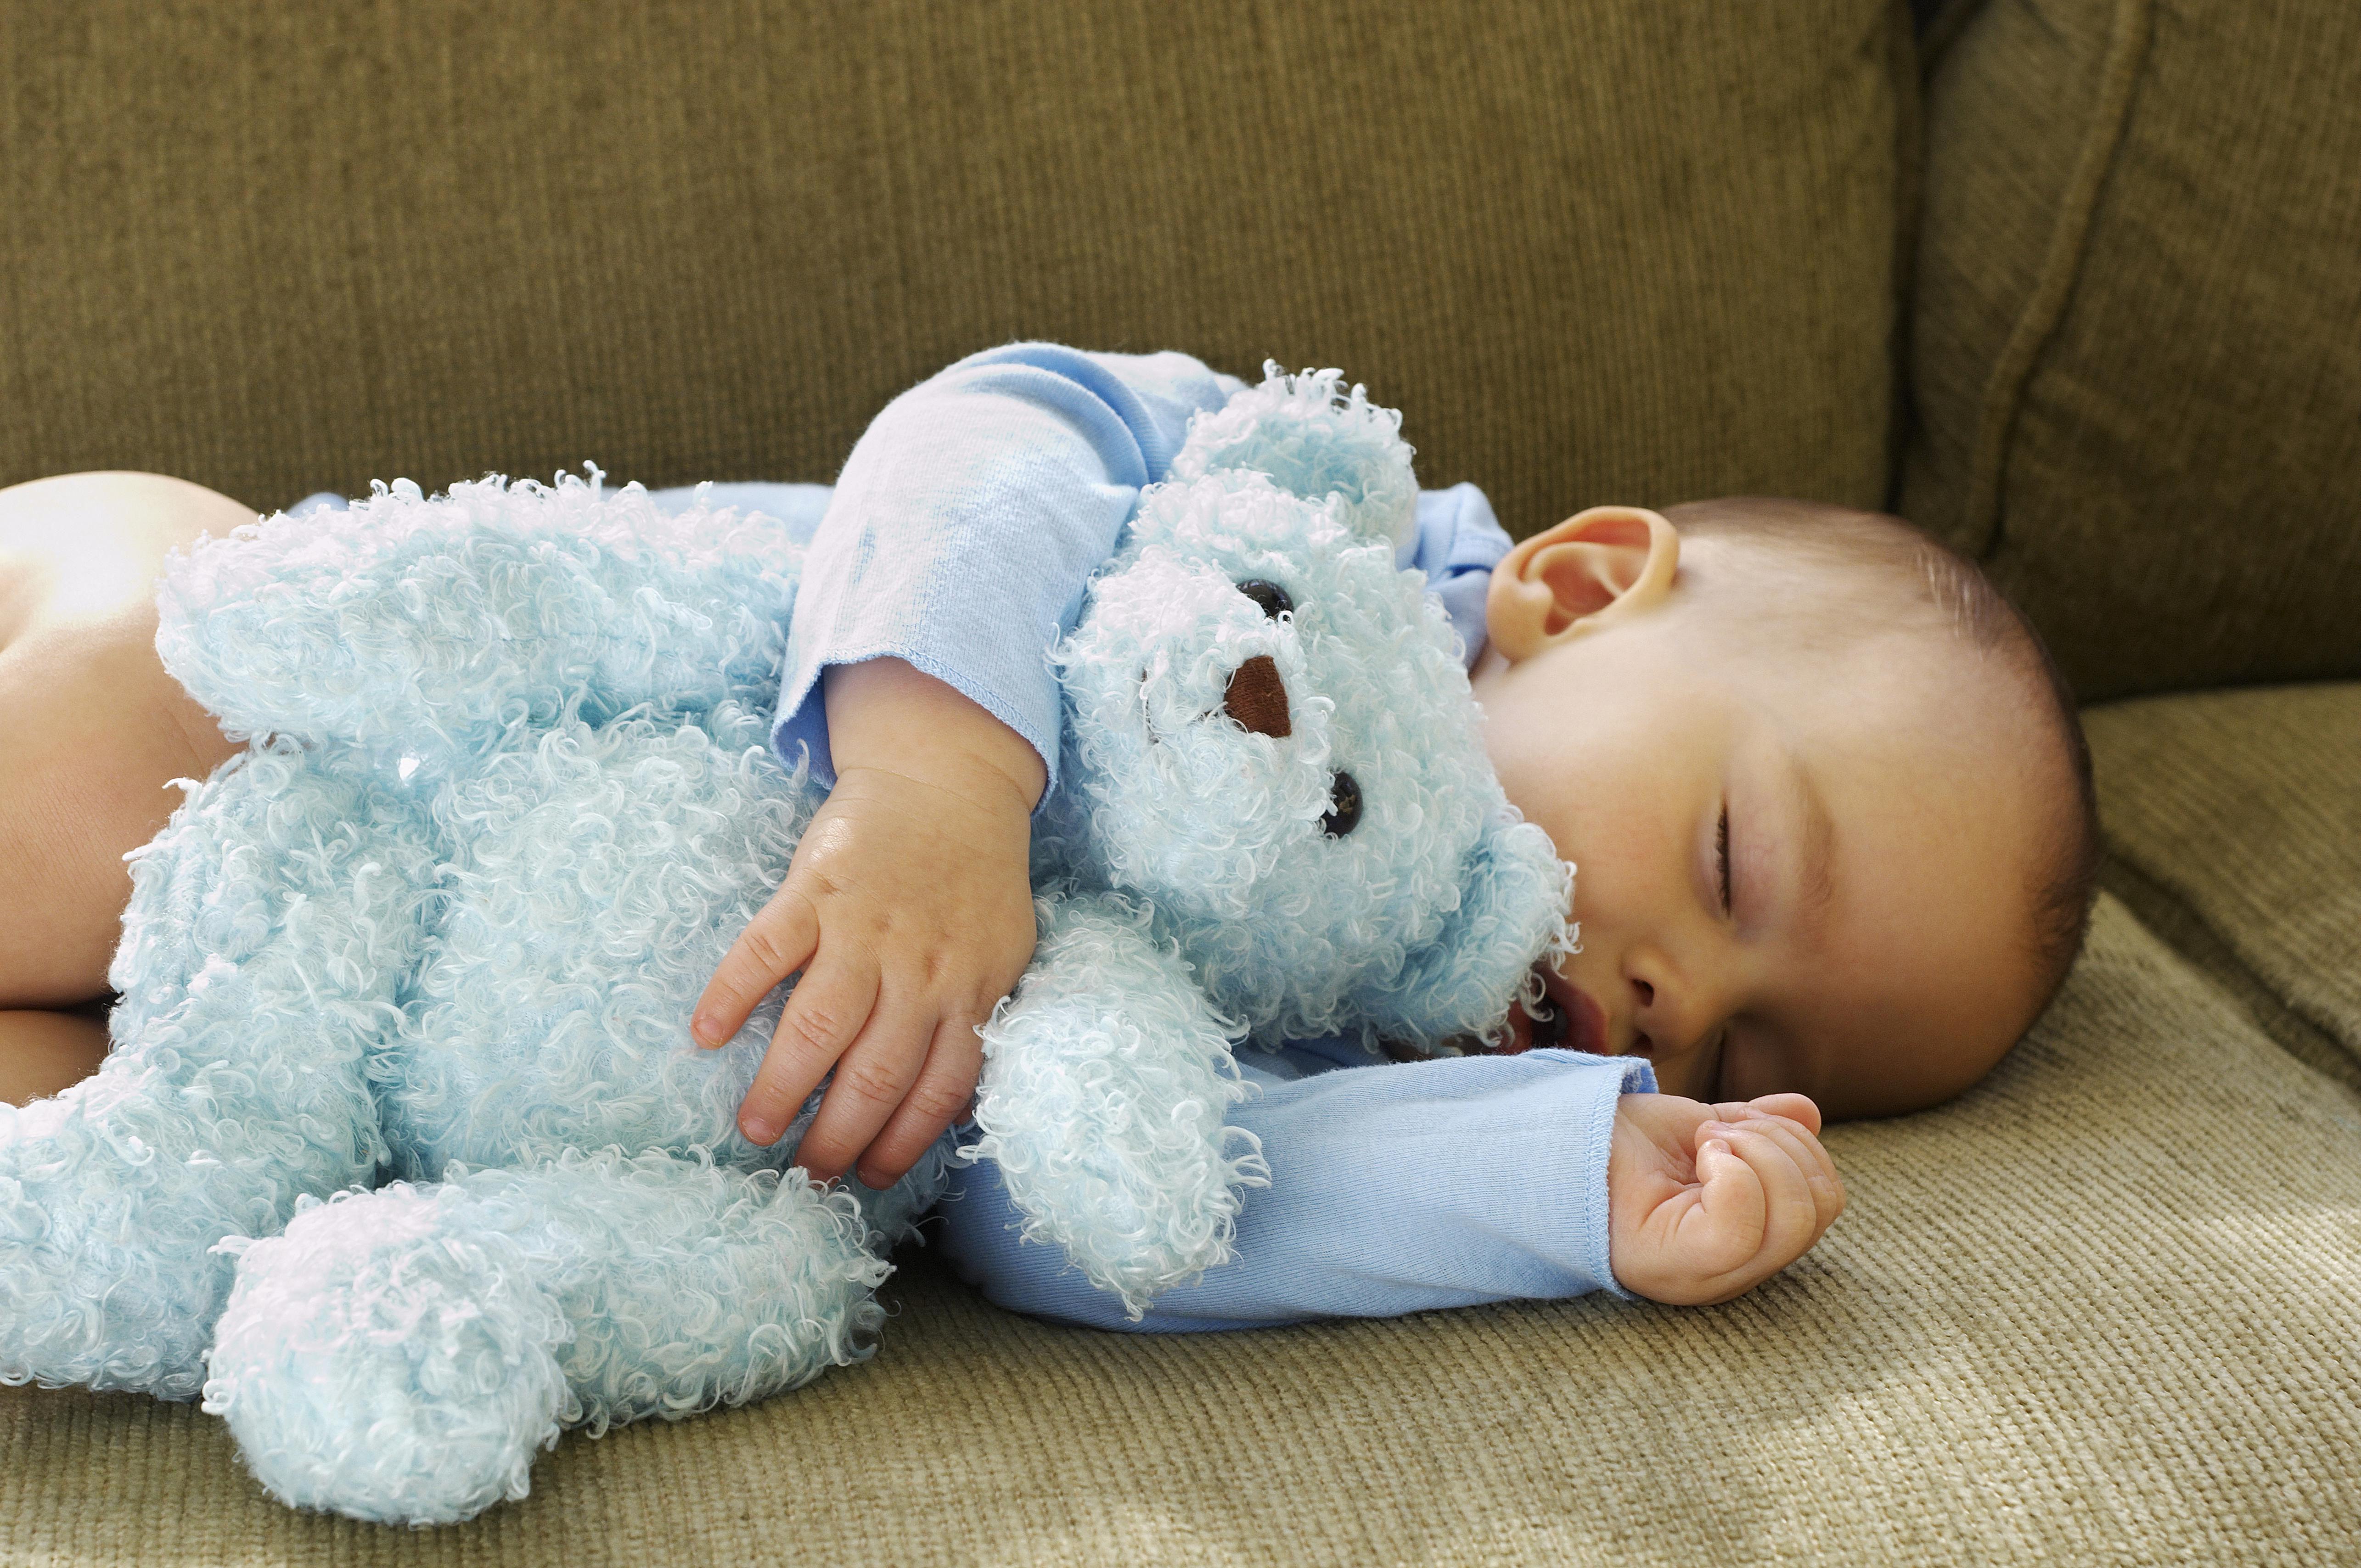 Baby Boy Sleeping with Teddy Bear